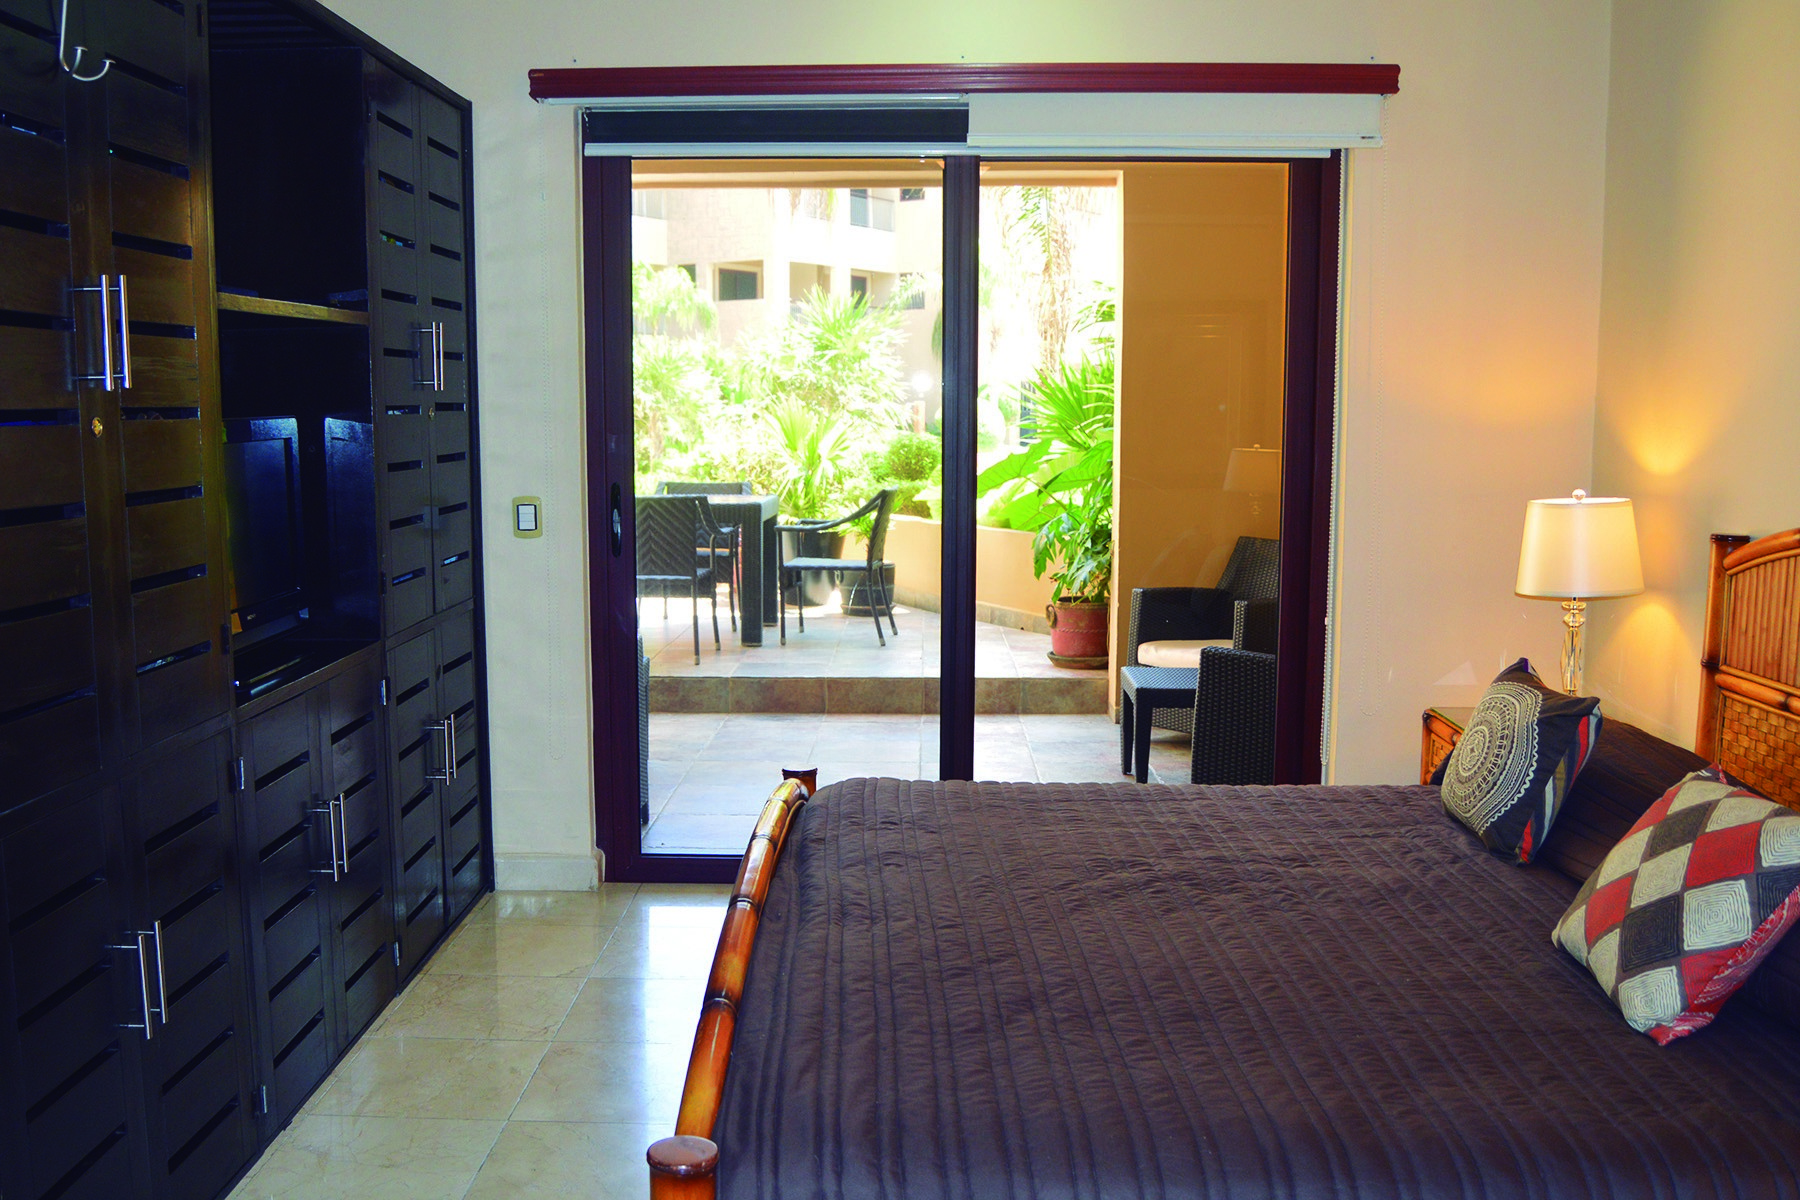 Additional photo for property listing at CONDOMINIO DE FRENTE DE PLAYA EN UBICACIÓN PRIVILEGIADA Beachfront home in a privileged location North 8th Street & 10th Playa Del Carmen, Quintana Roo 77710 México